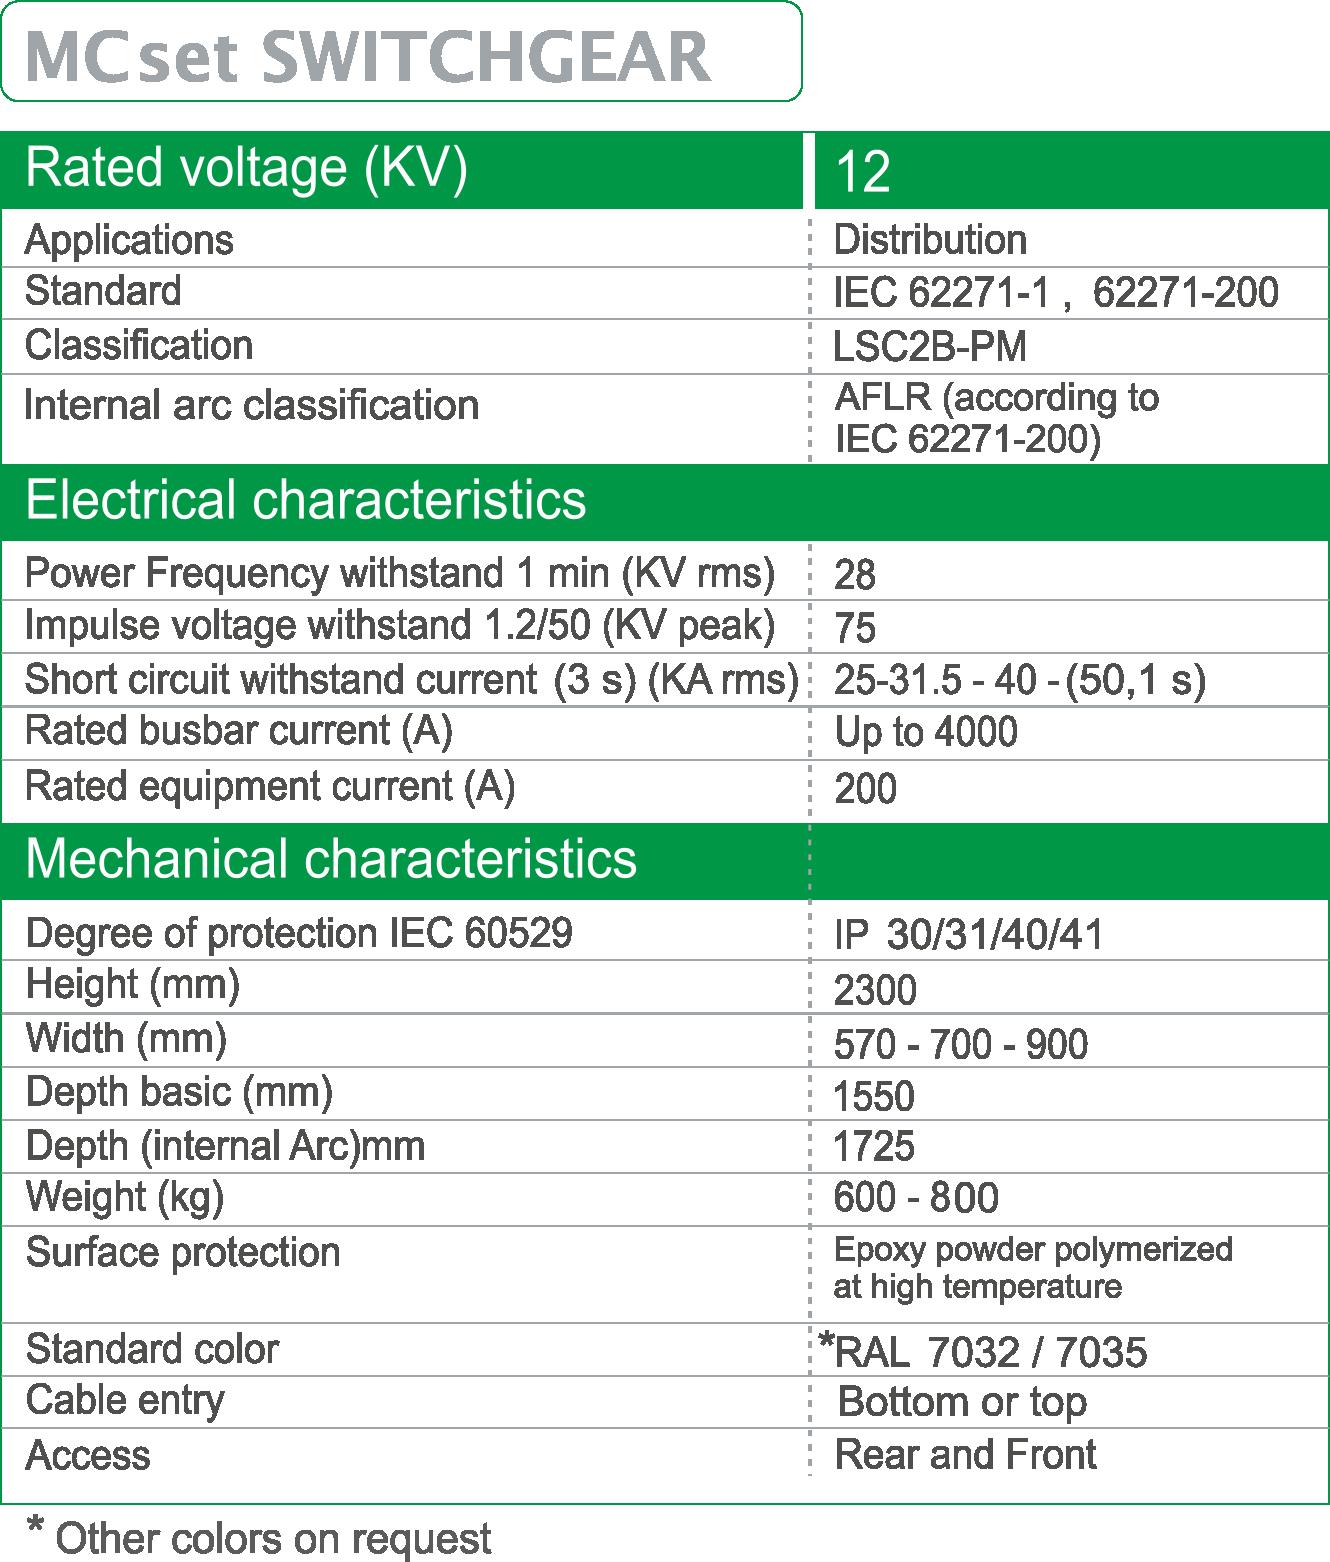 MCset-12KV